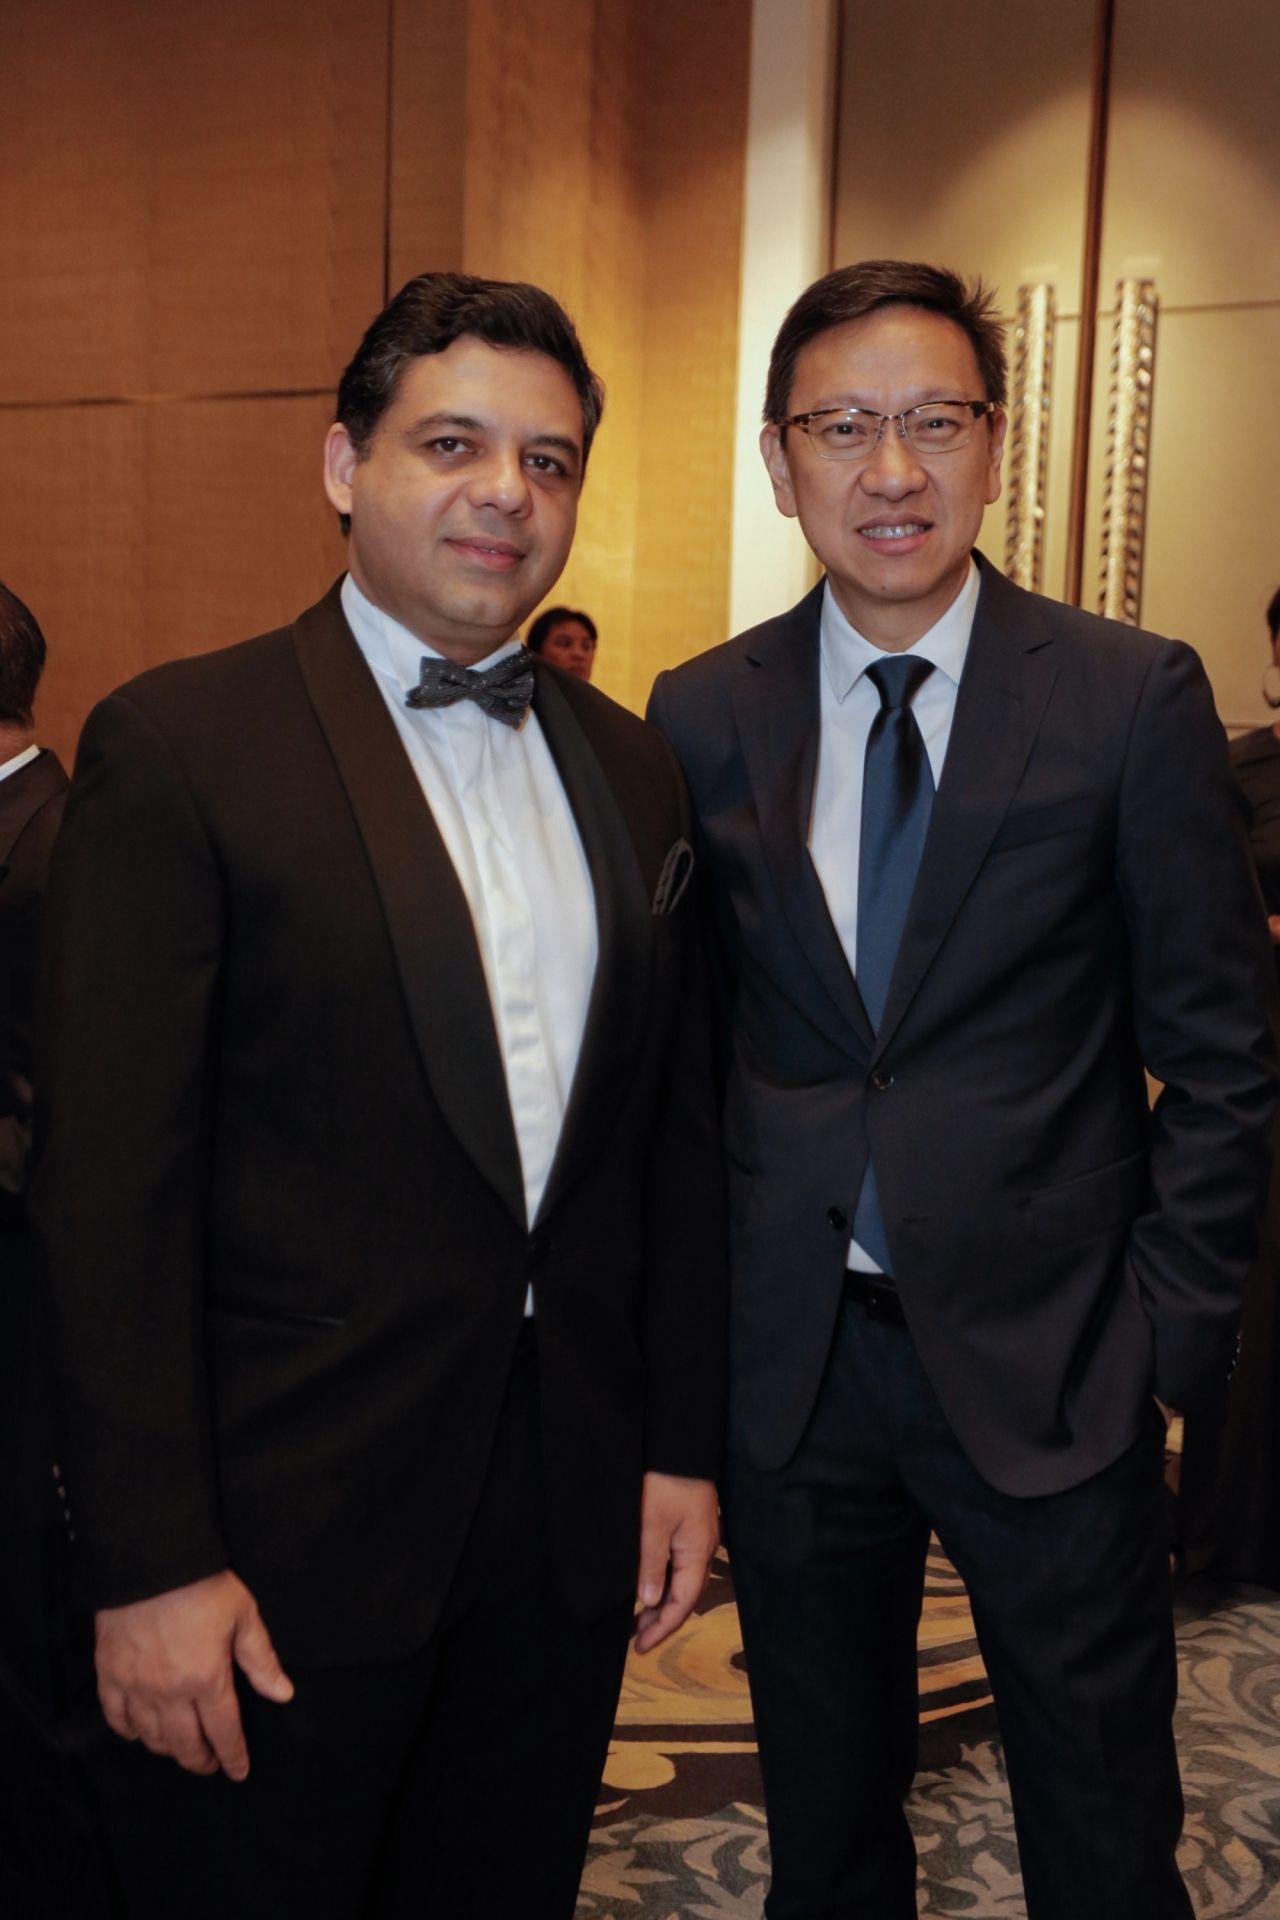 Amit Oberoi and Emerson Yao